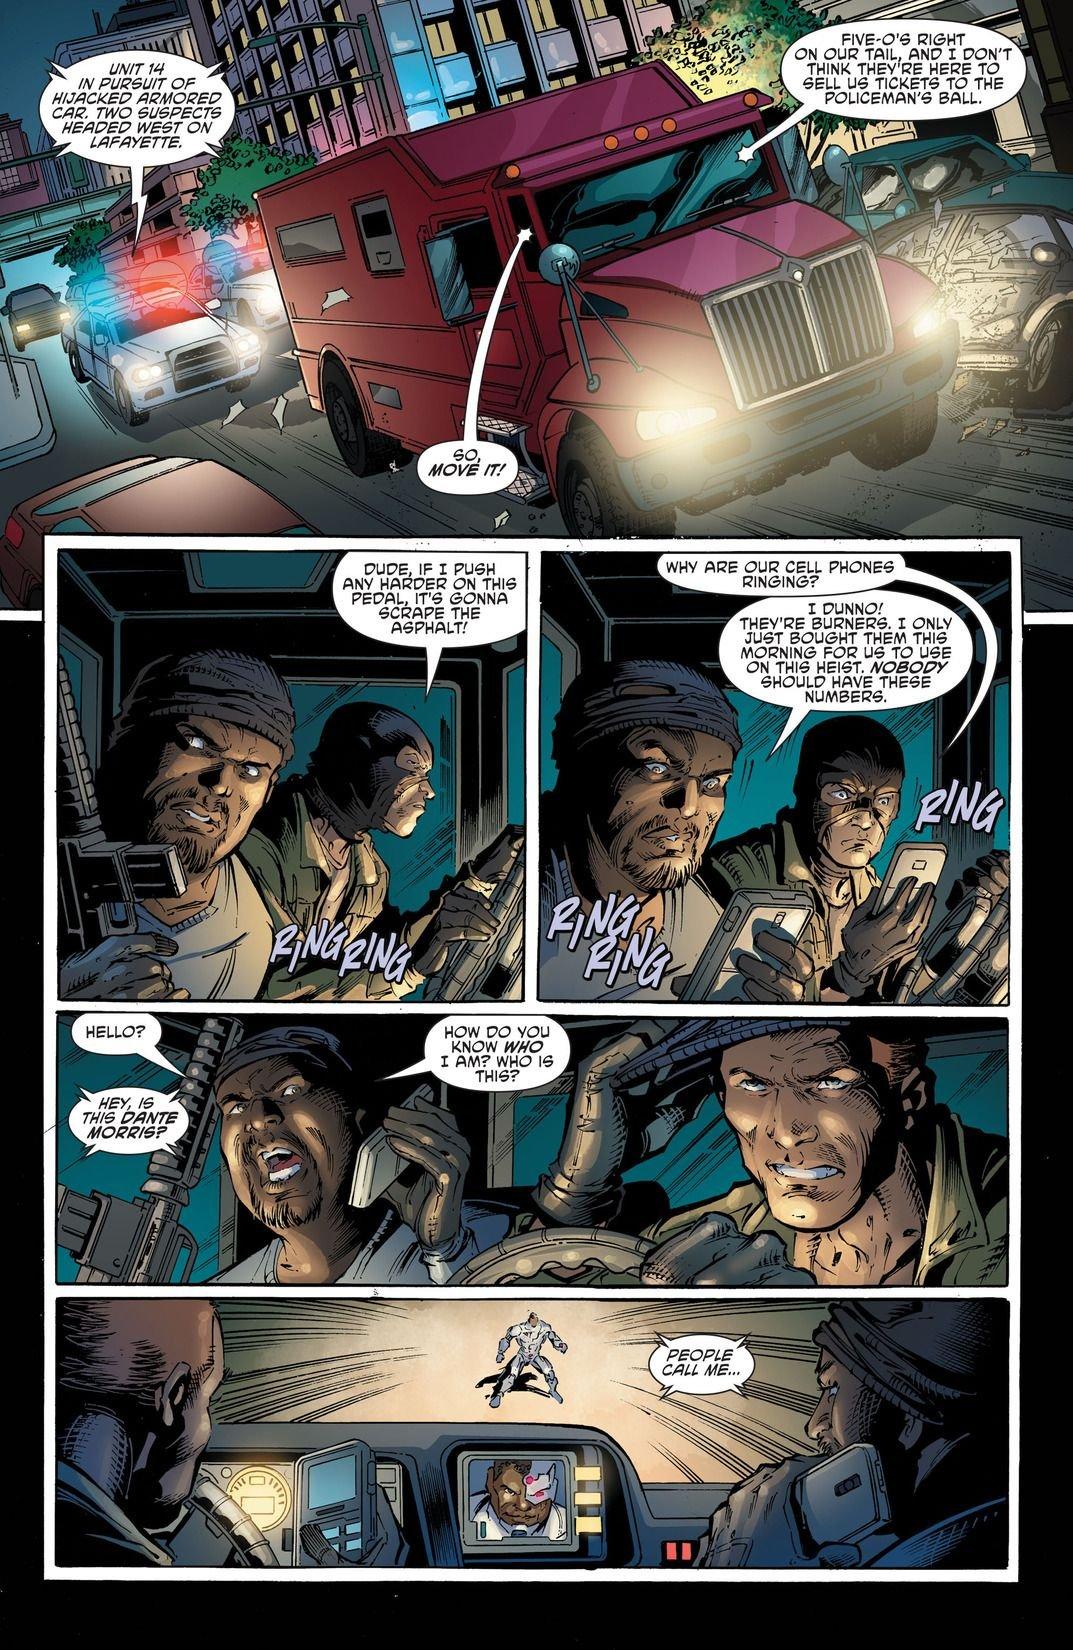 Cyborg Rebirth #1 (Comic) Review 1